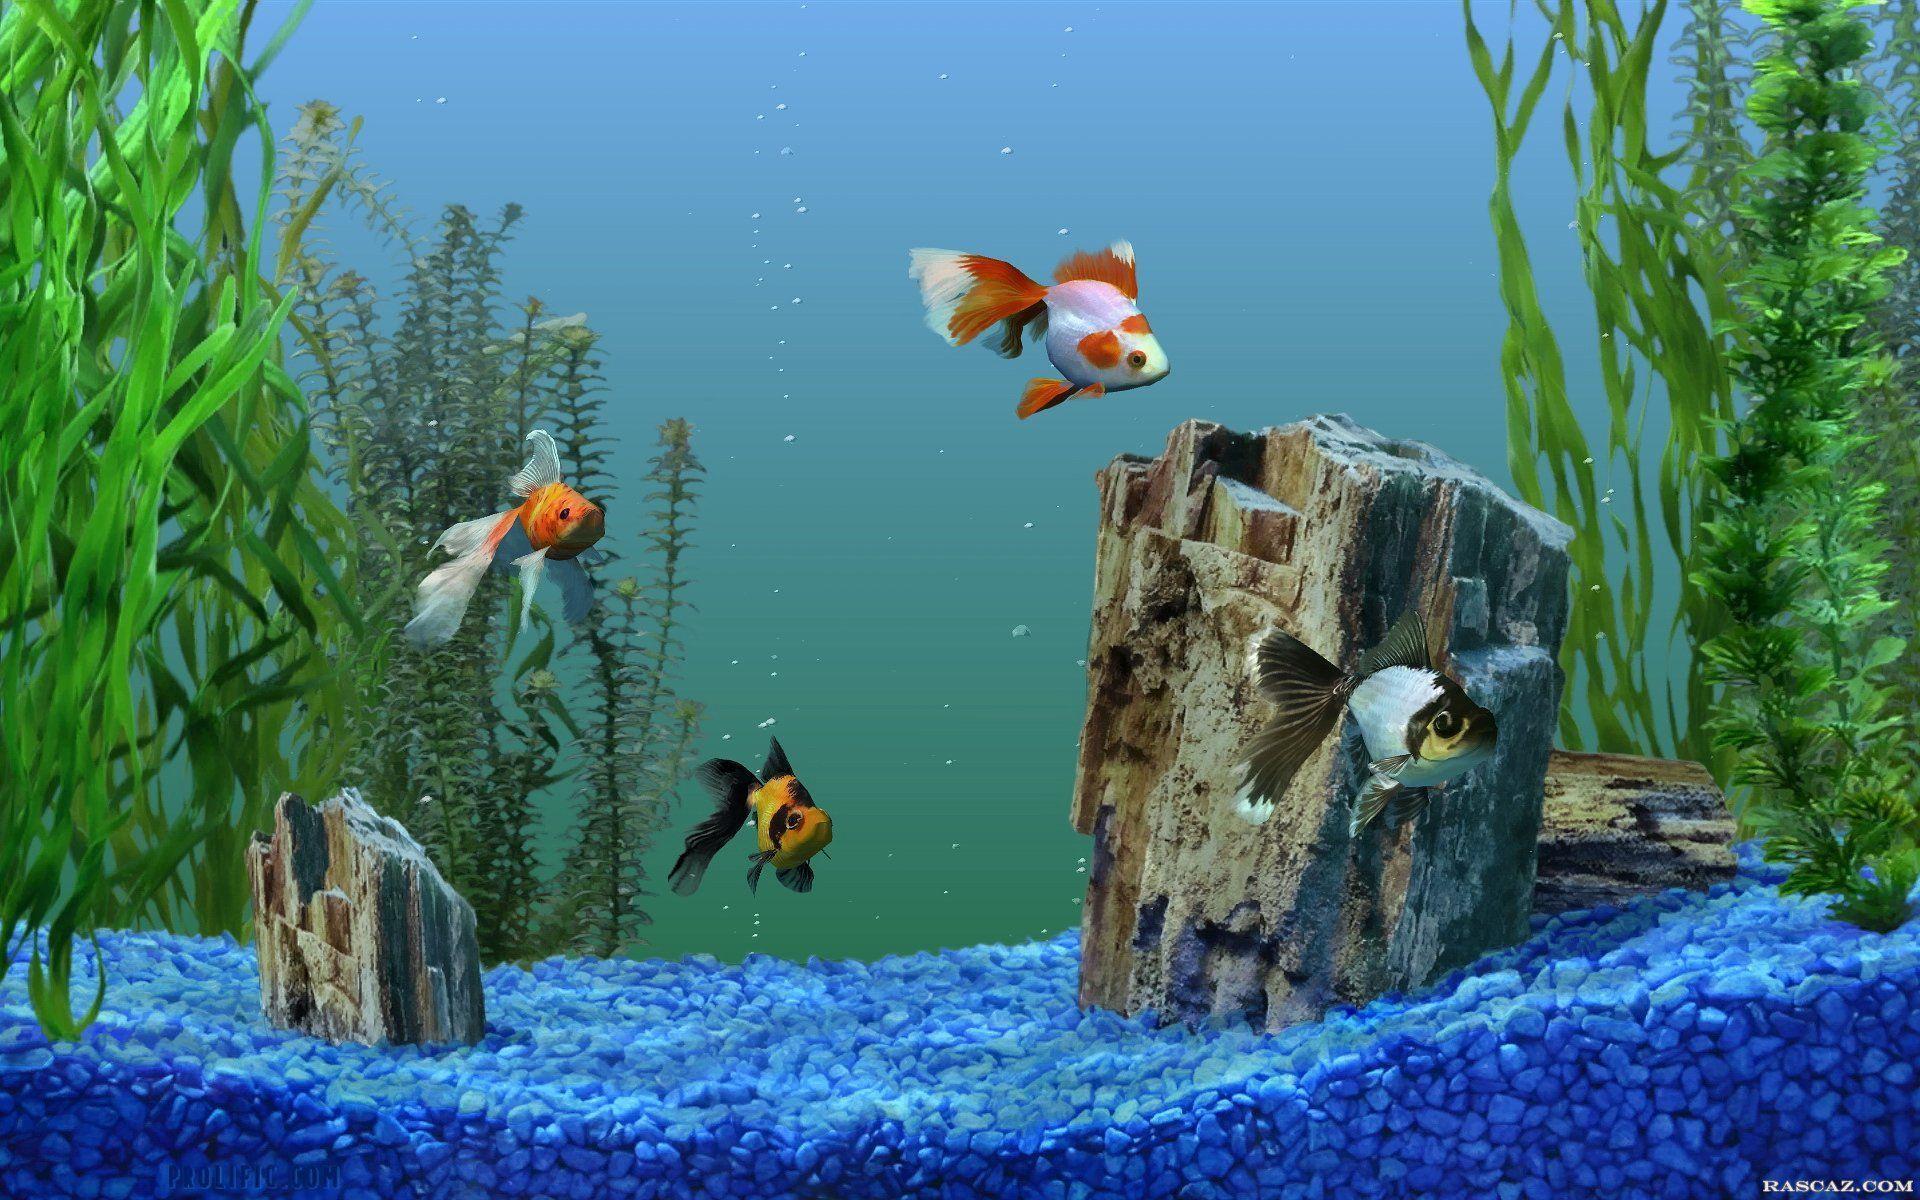 Google screensavers and wallpapers wallpaper cave - Fish tank screensaver pc free ...